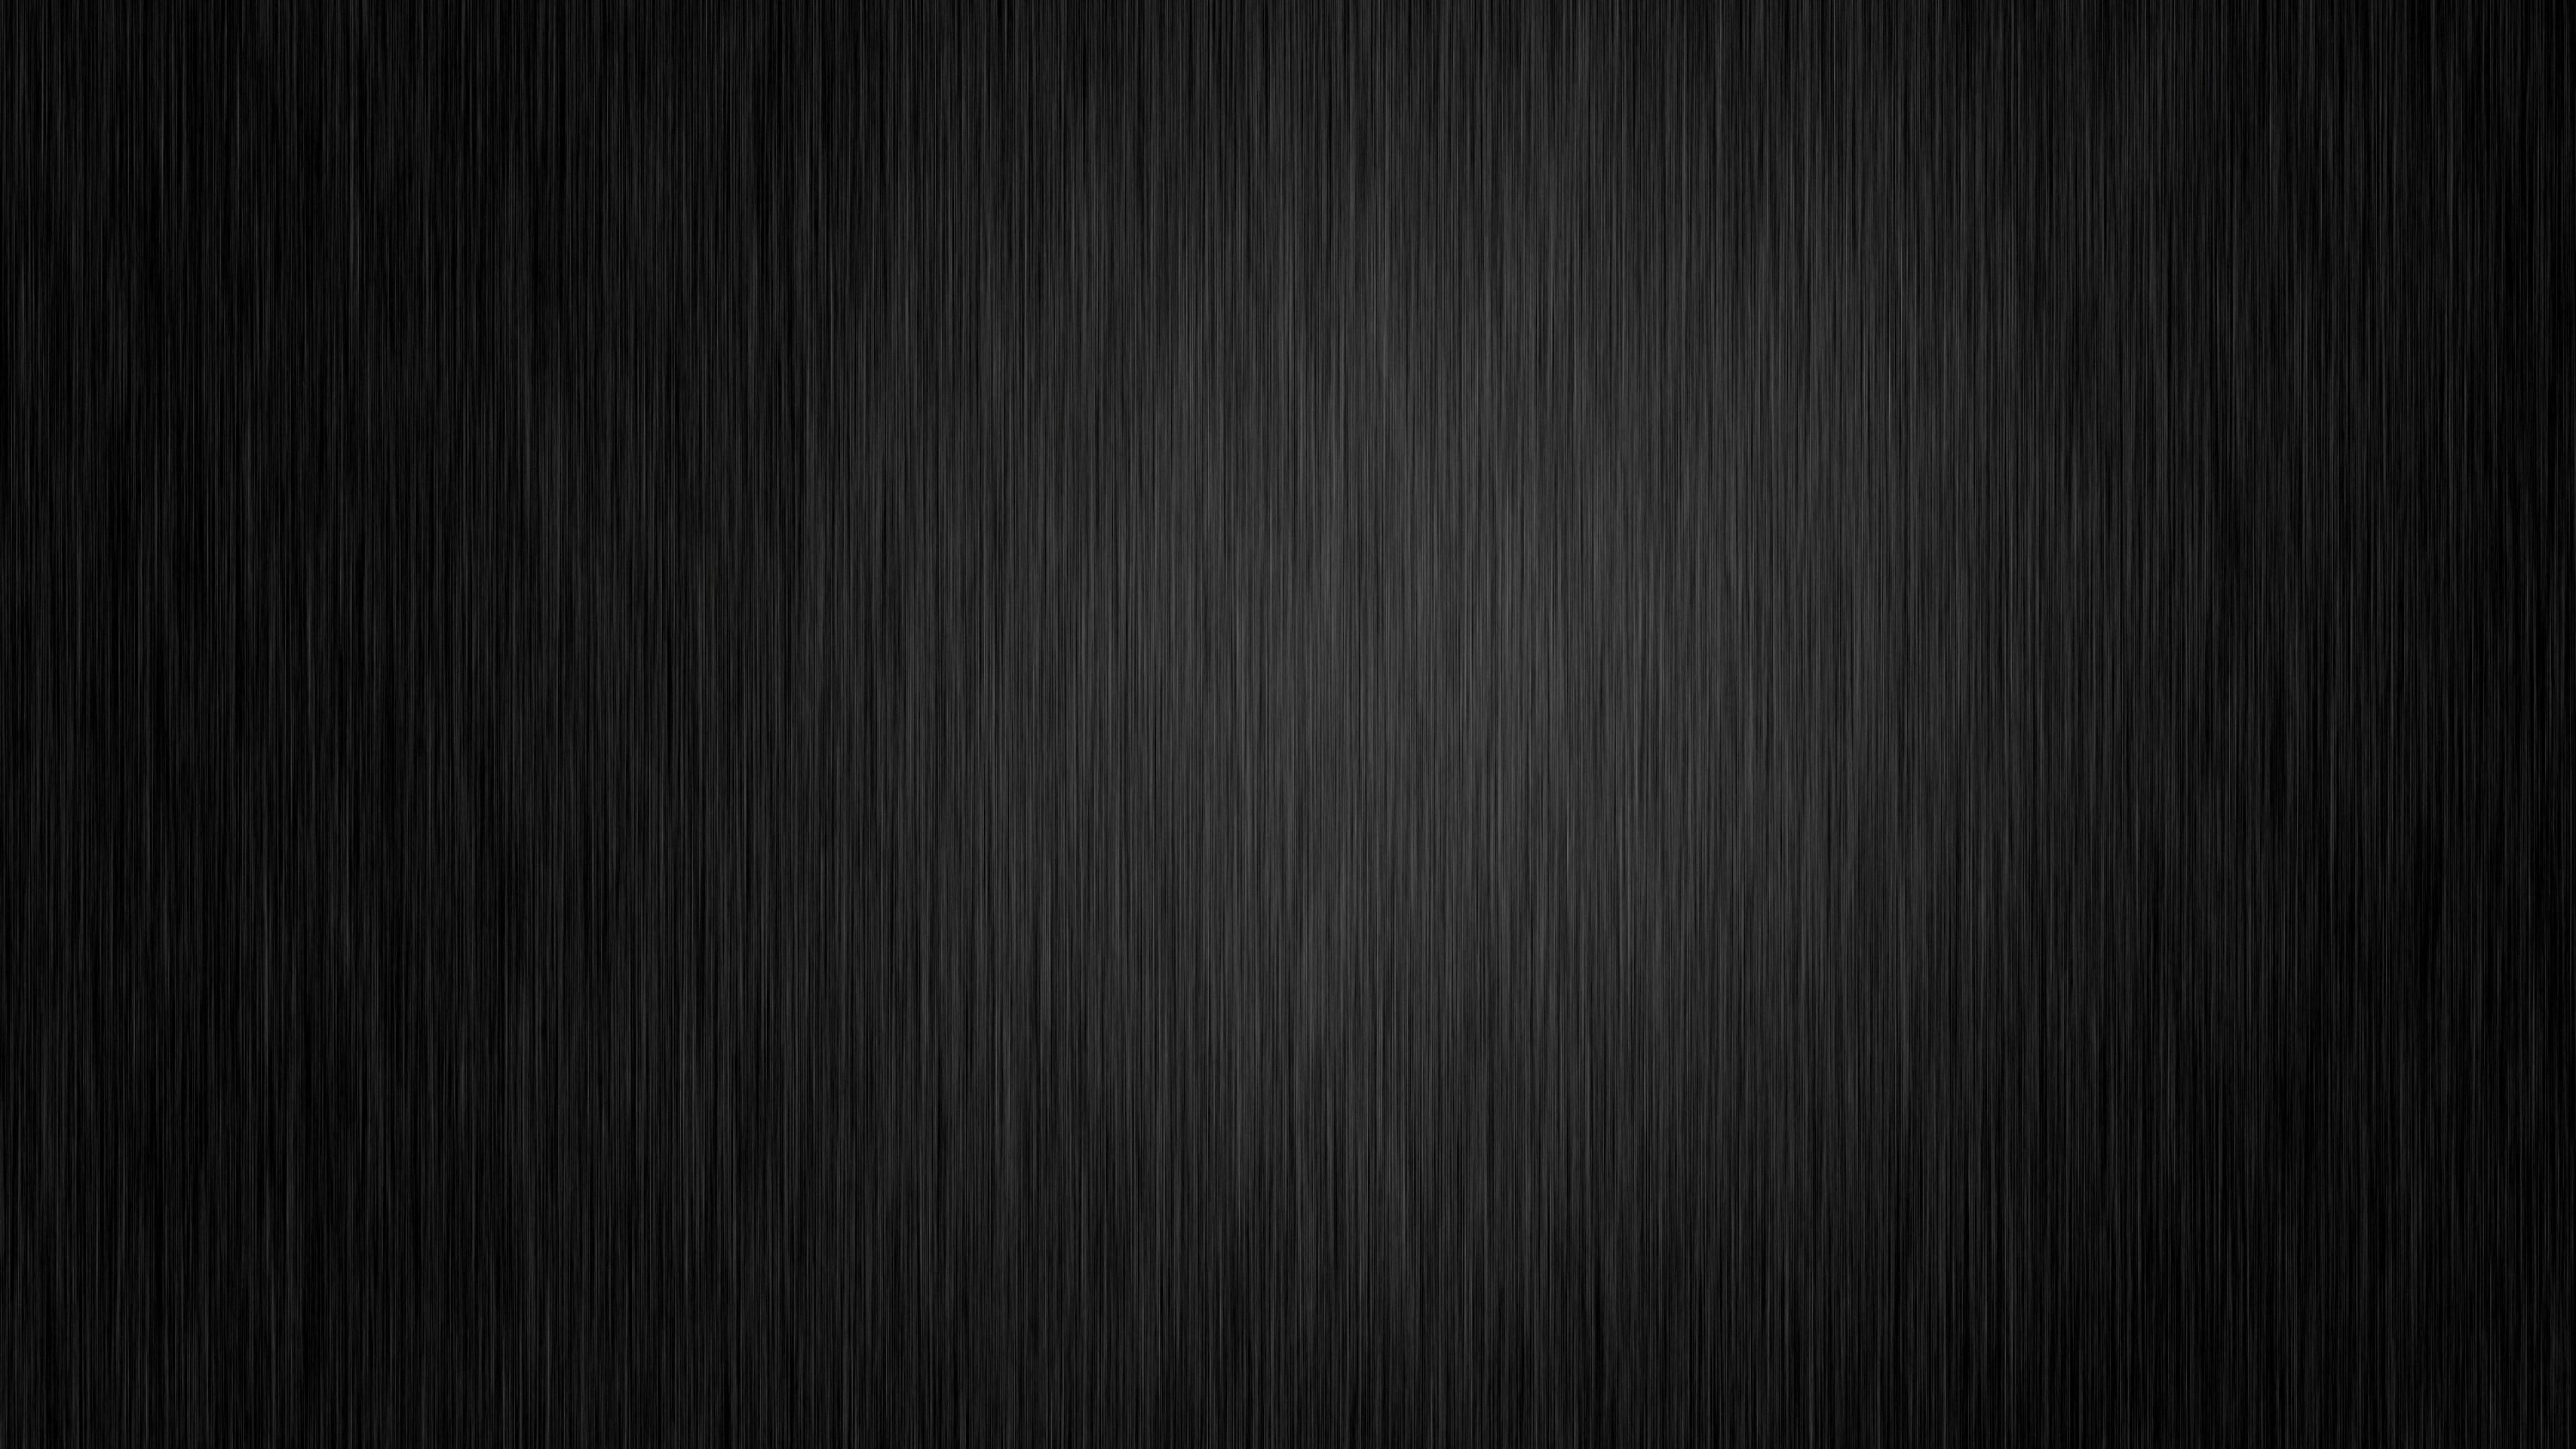 Black Lines Scratches Texture Background 4K Wallpaper